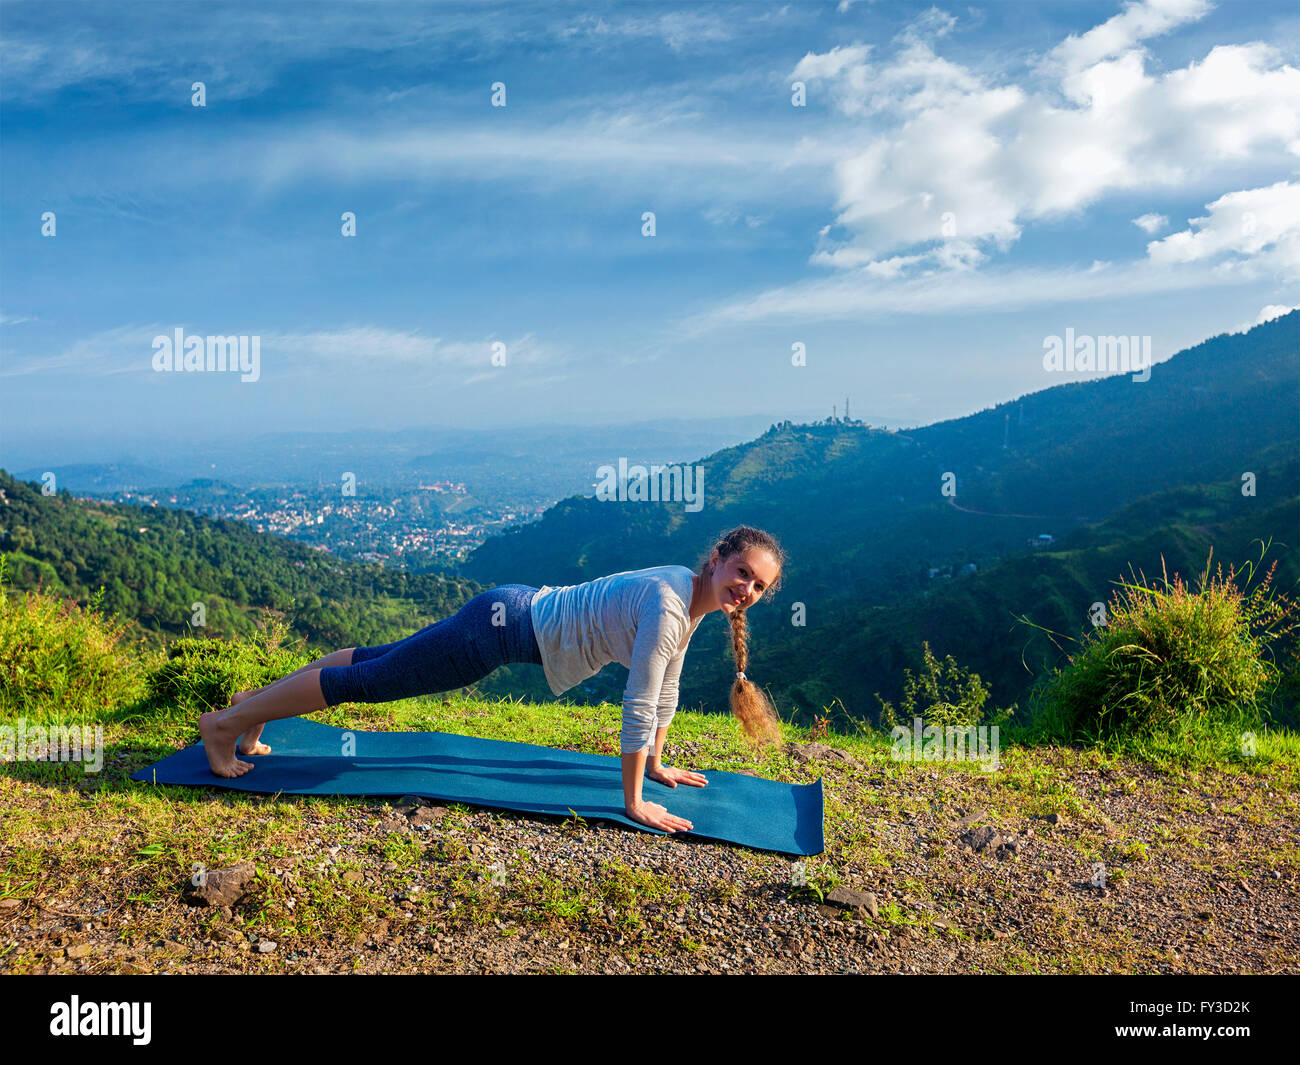 Woman doing Hatha yoga asana plank pose outdoors - Stock Image